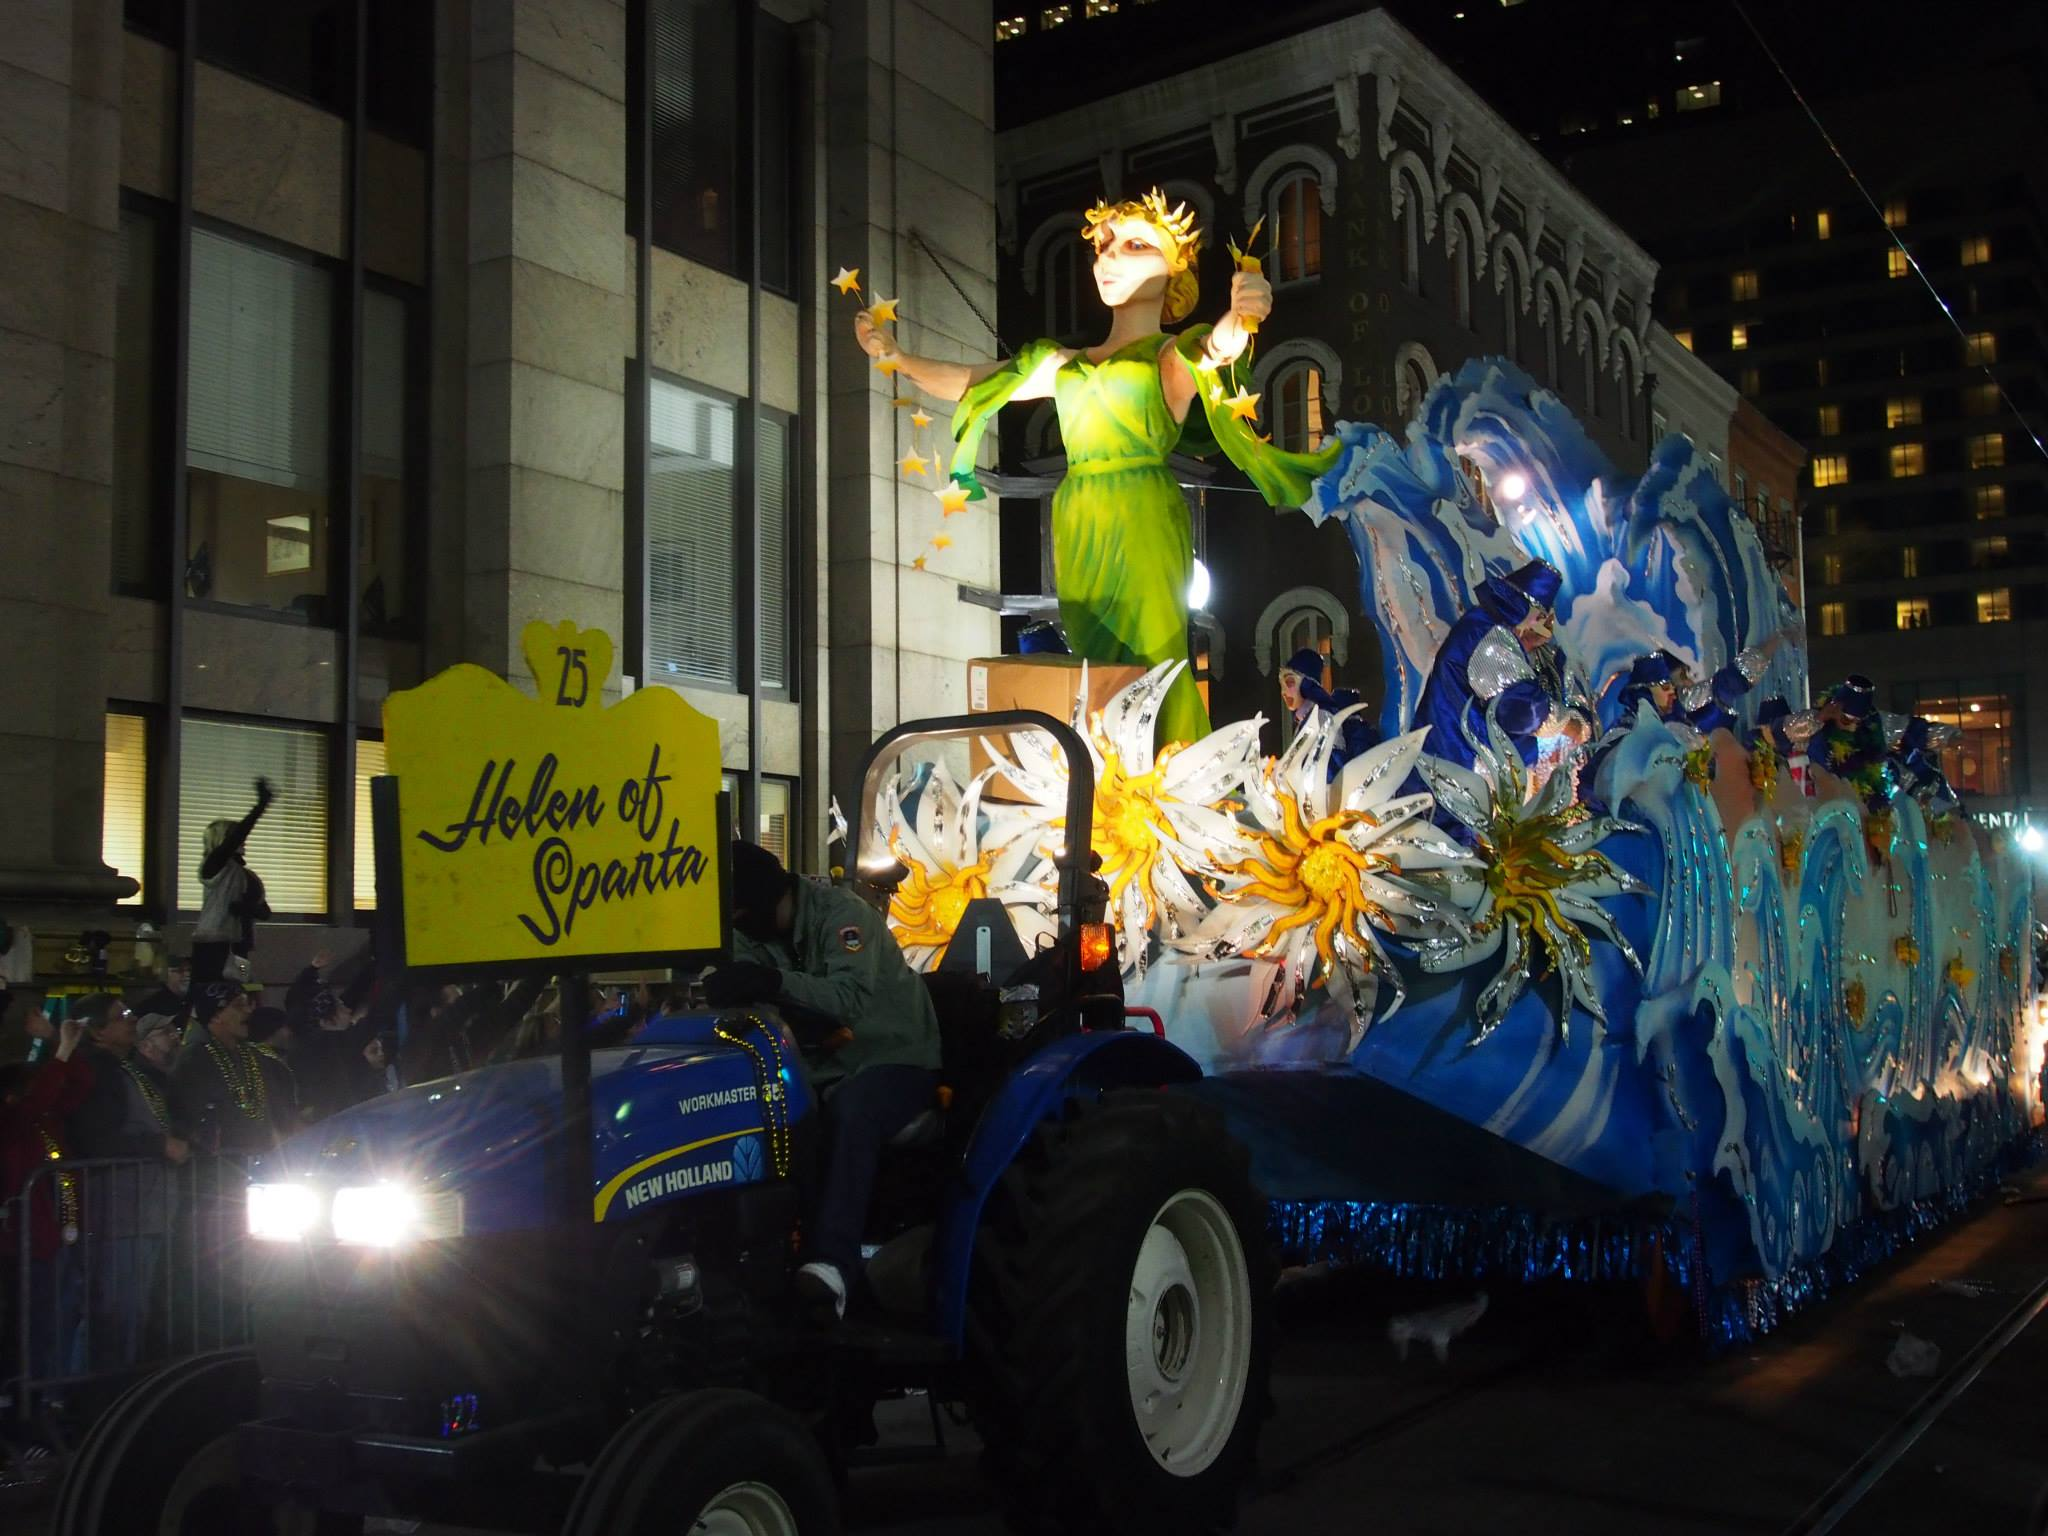 mardi-gras-parade-float-new-orleans